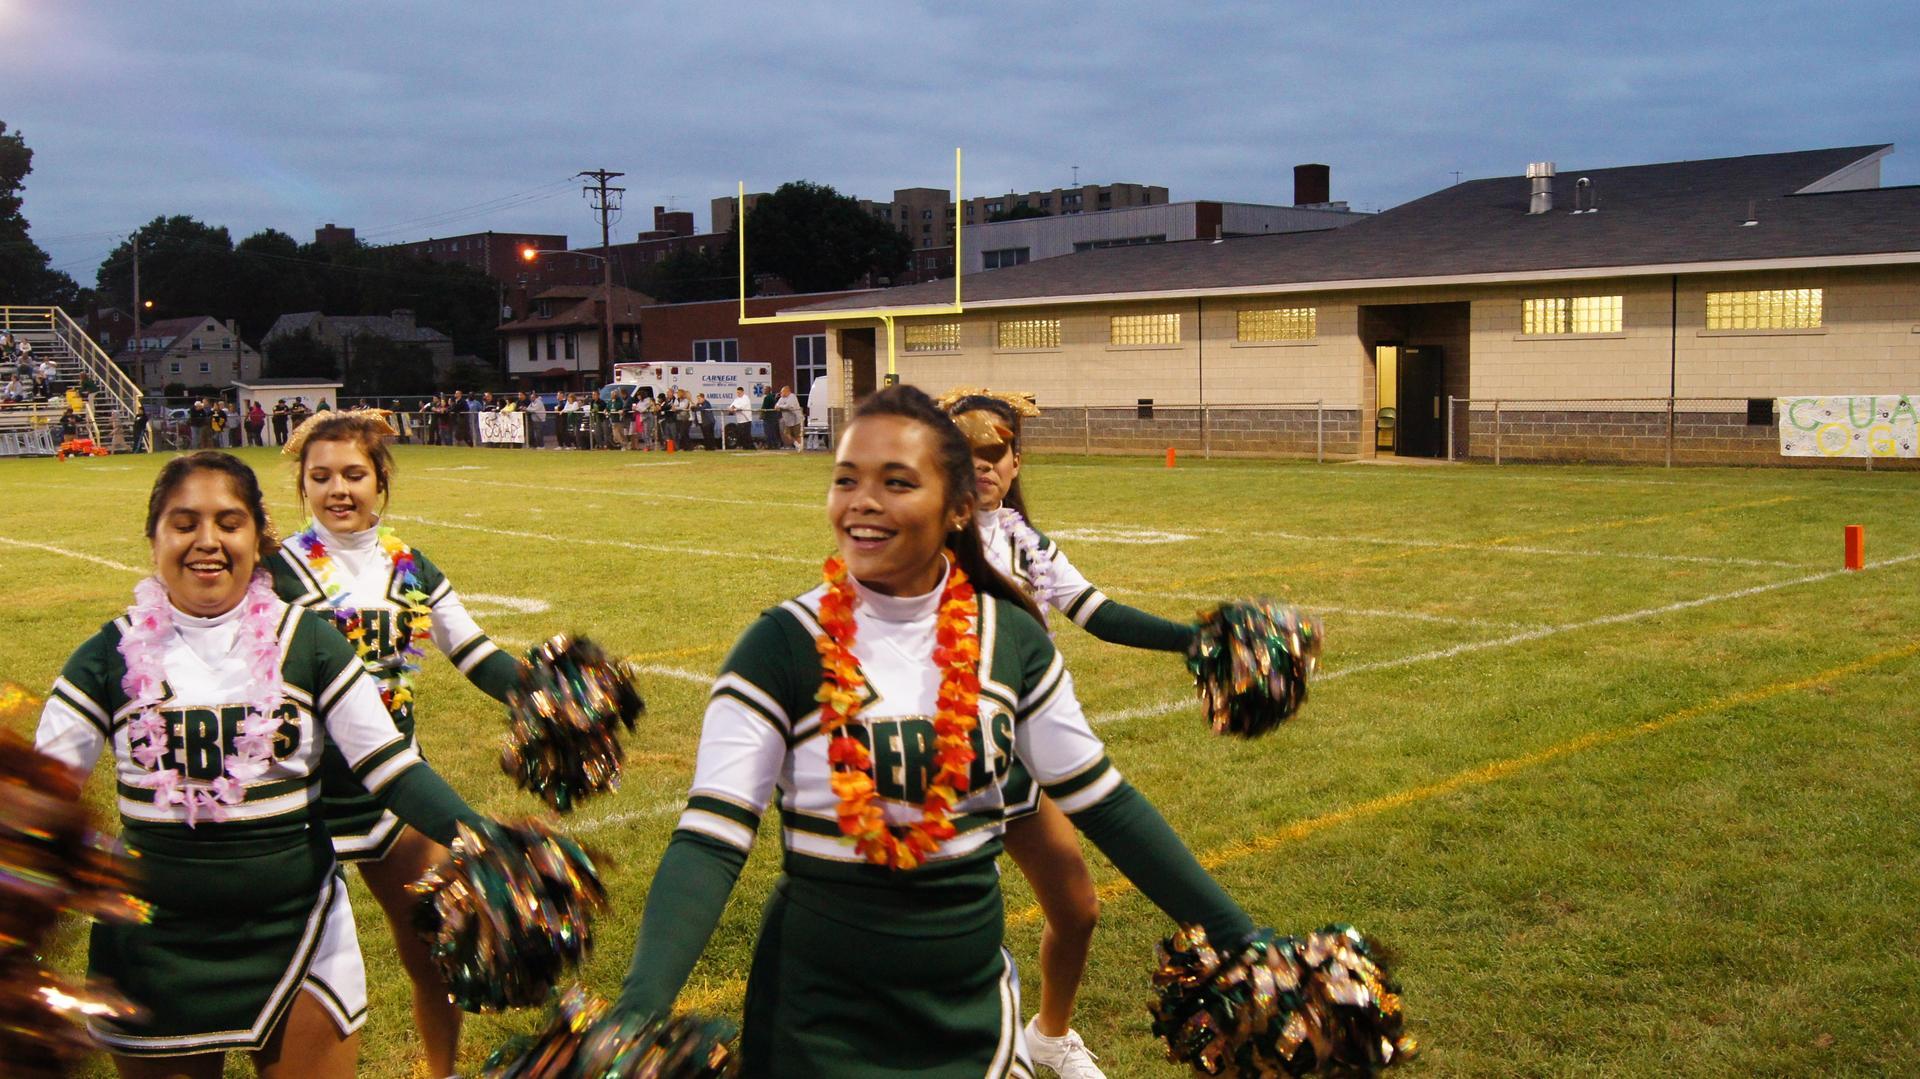 Cheerleaders at football game